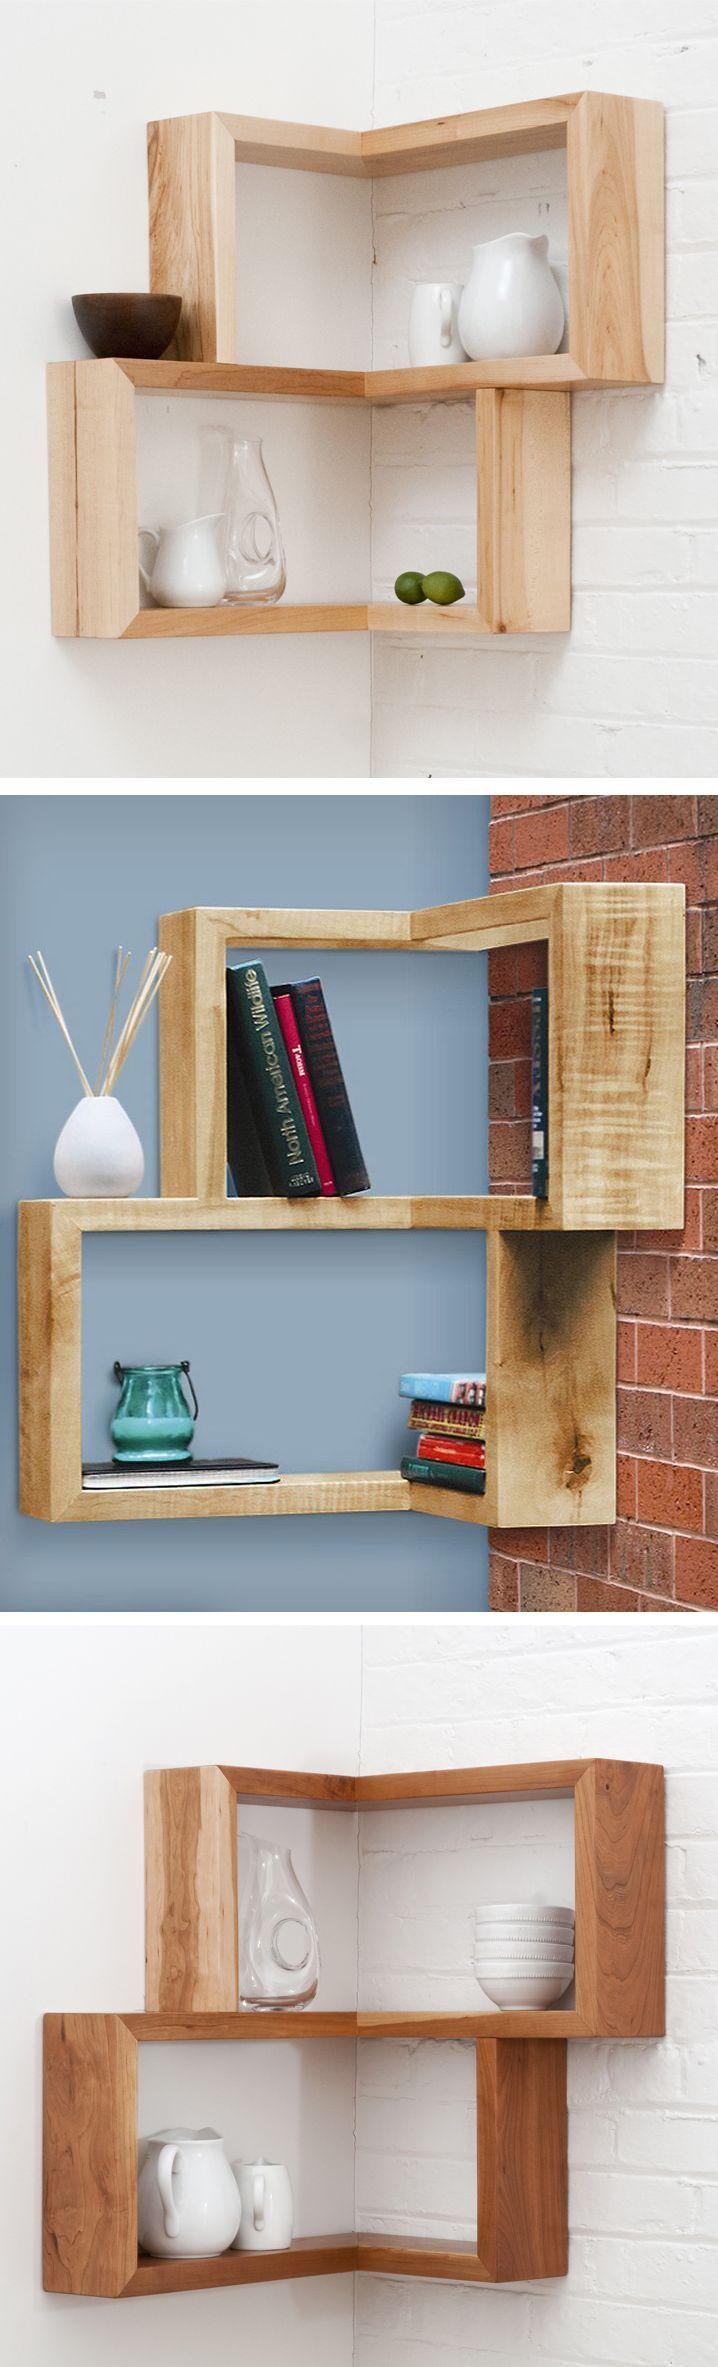 Clever corner shelf // this is a brilliant design idea for an awkward, empty corner